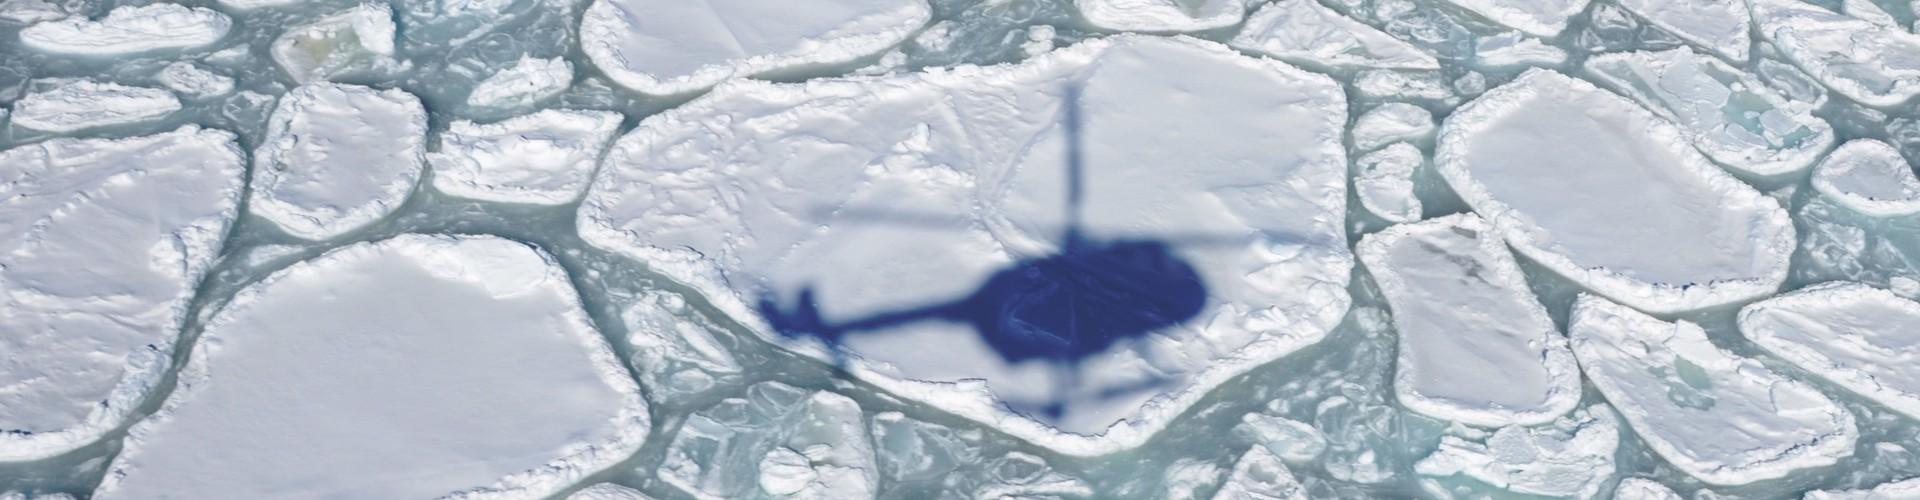 Flying shadow (Credit: Jan-Marcus Nasse (distributed via imaggeo.egu.eu))